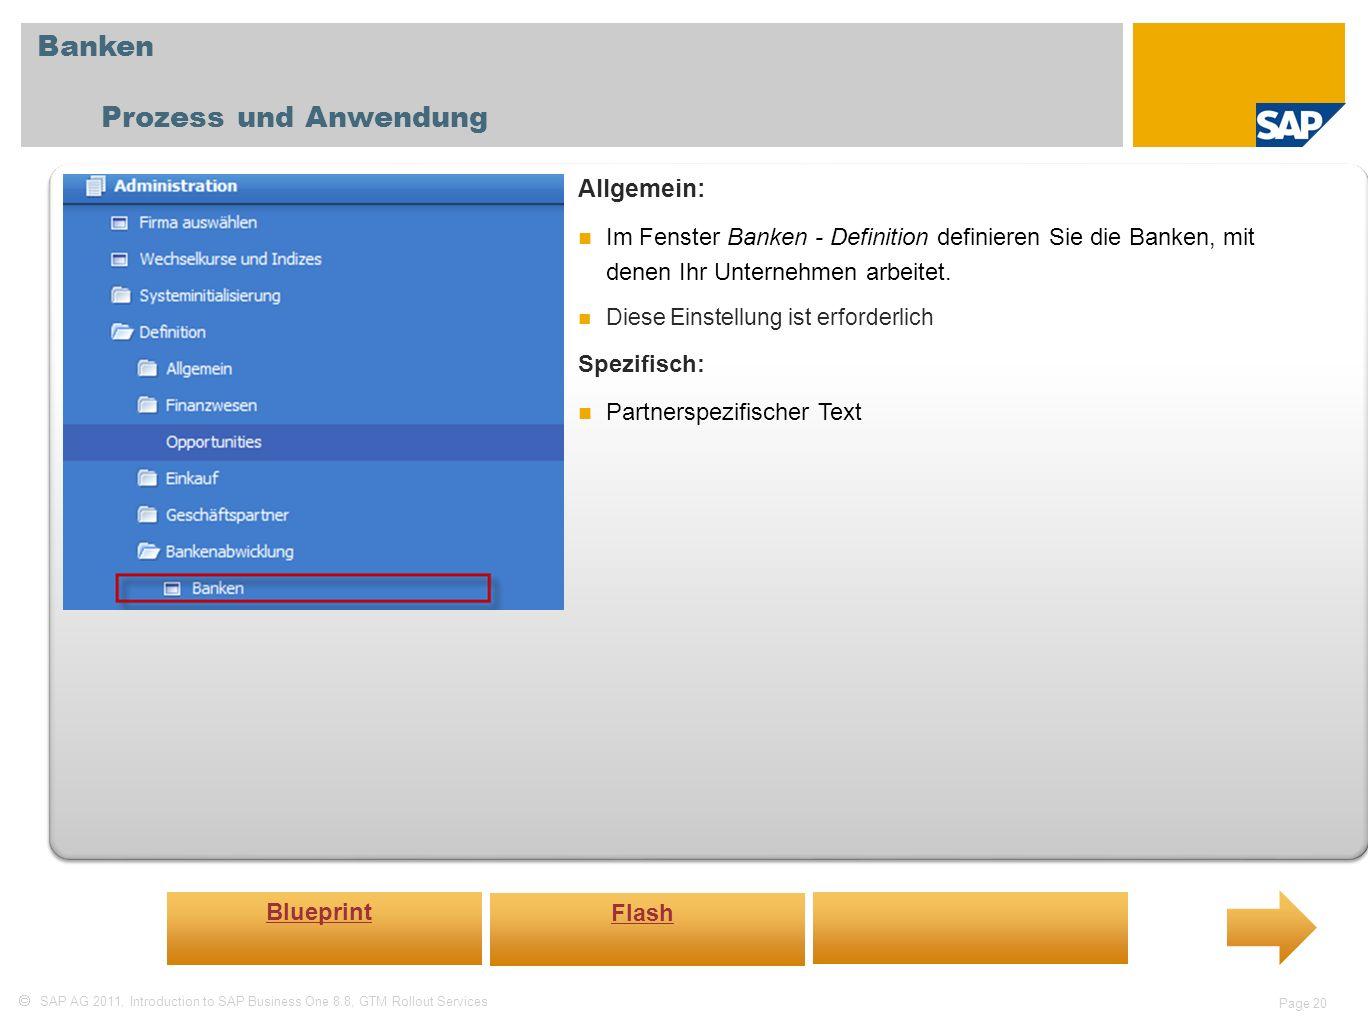 SAP AG 2011, Introduction to SAP Business One 8.8, GTM Rollout Services Page 20 Banken Prozess und Anwendung Allgemein: Im Fenster Banken - Definition